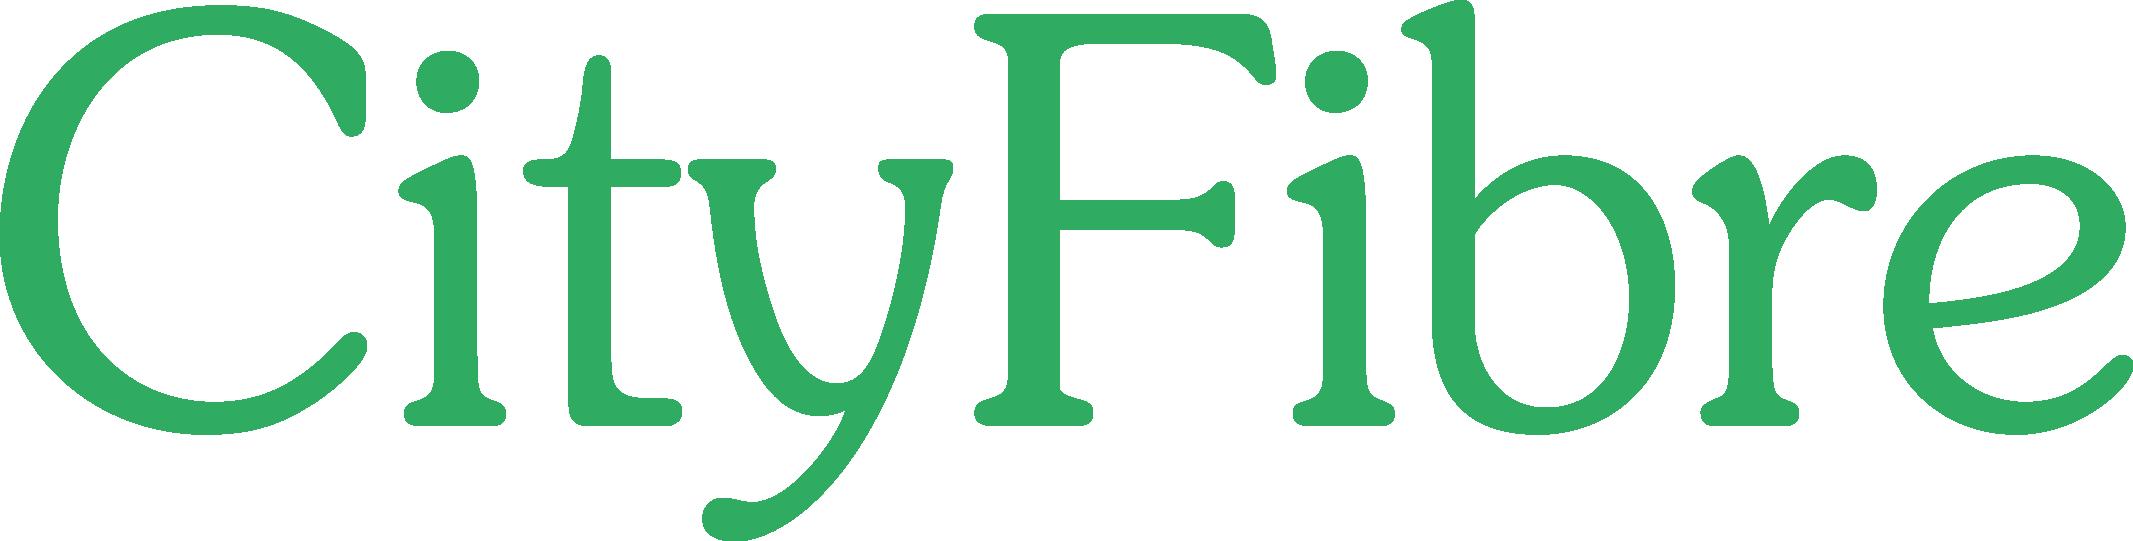 key_CF-logo-New-Green.png